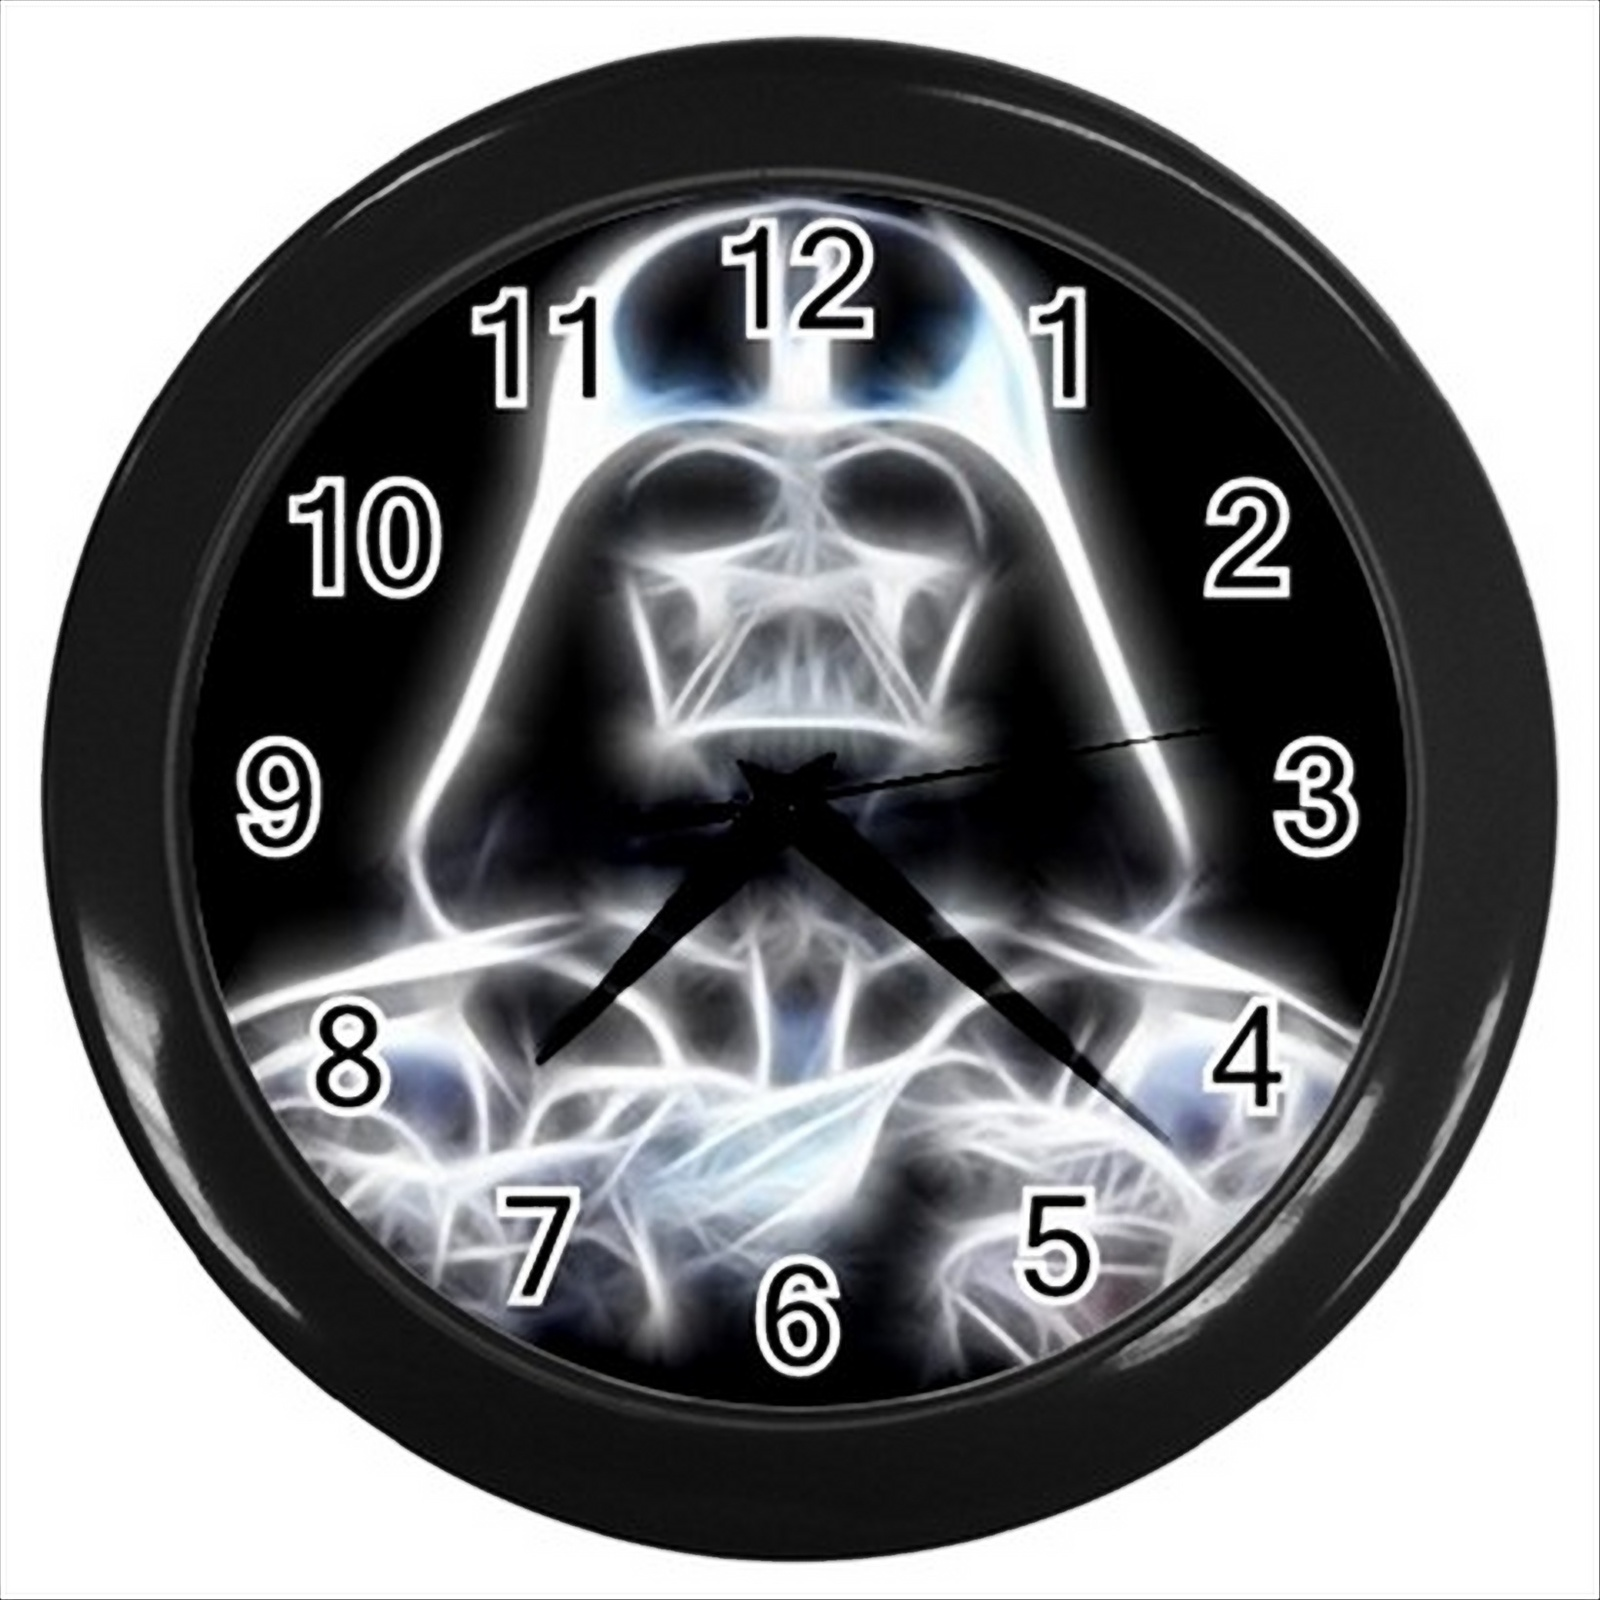 New darth vader star wars round black wall clock decor gift wall clocks - Darth vader wall clock ...